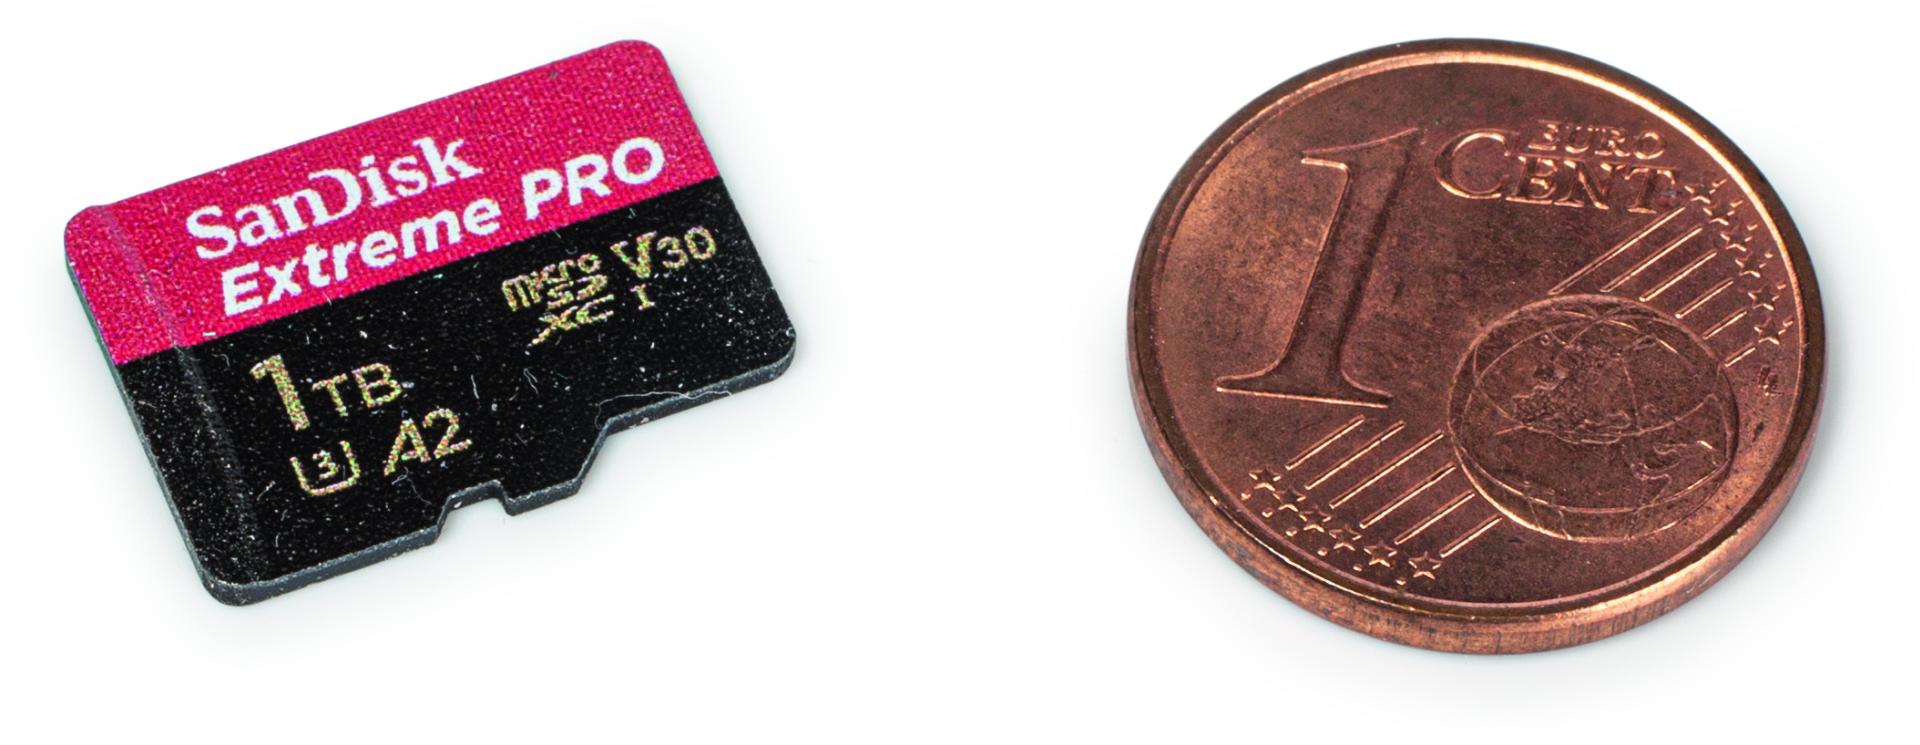 grote microSD-kaart geheugenkaart 1TB SanDisk Extreme Pro